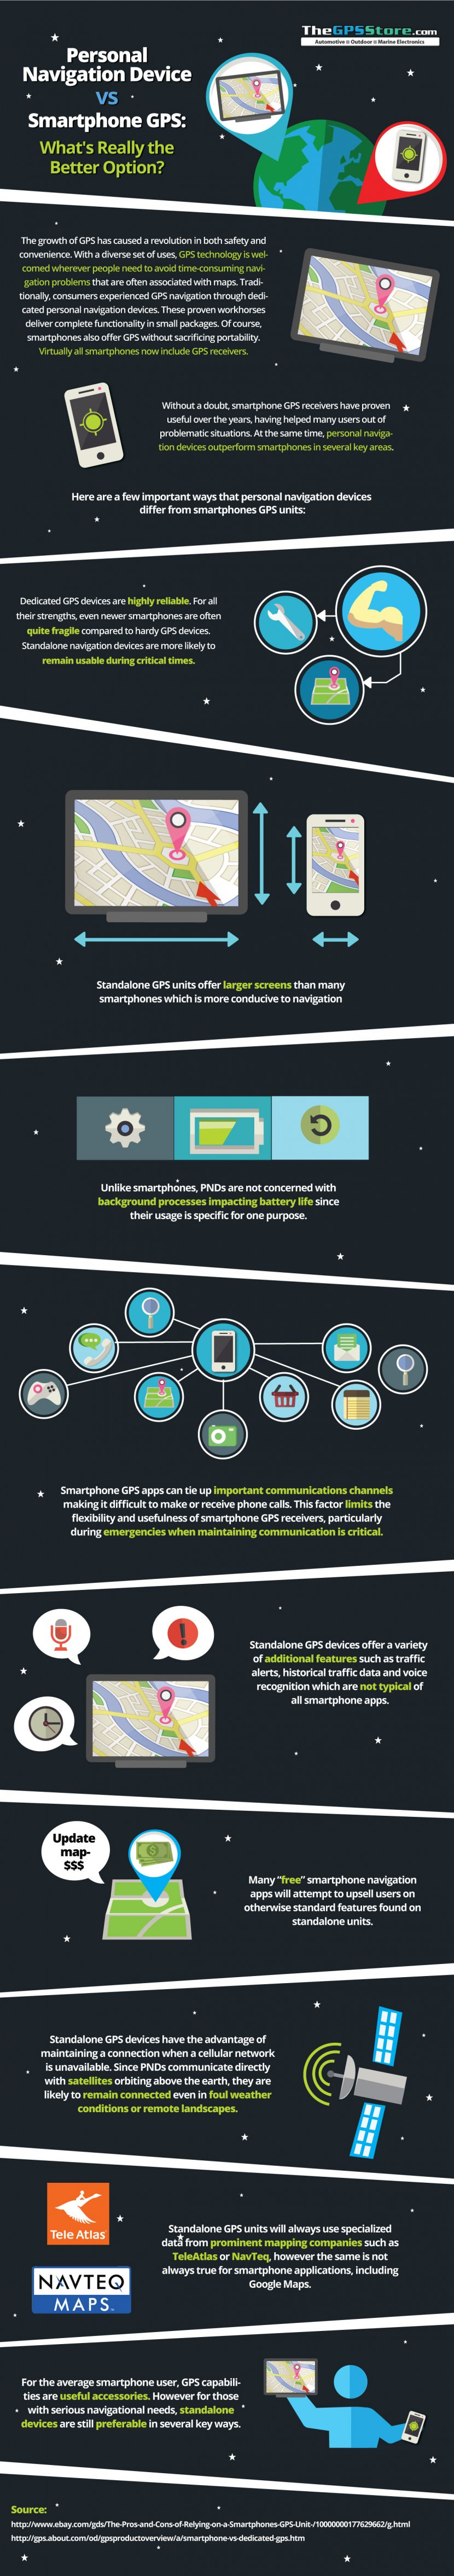 Dedicated GPS vs Smartphone GPS